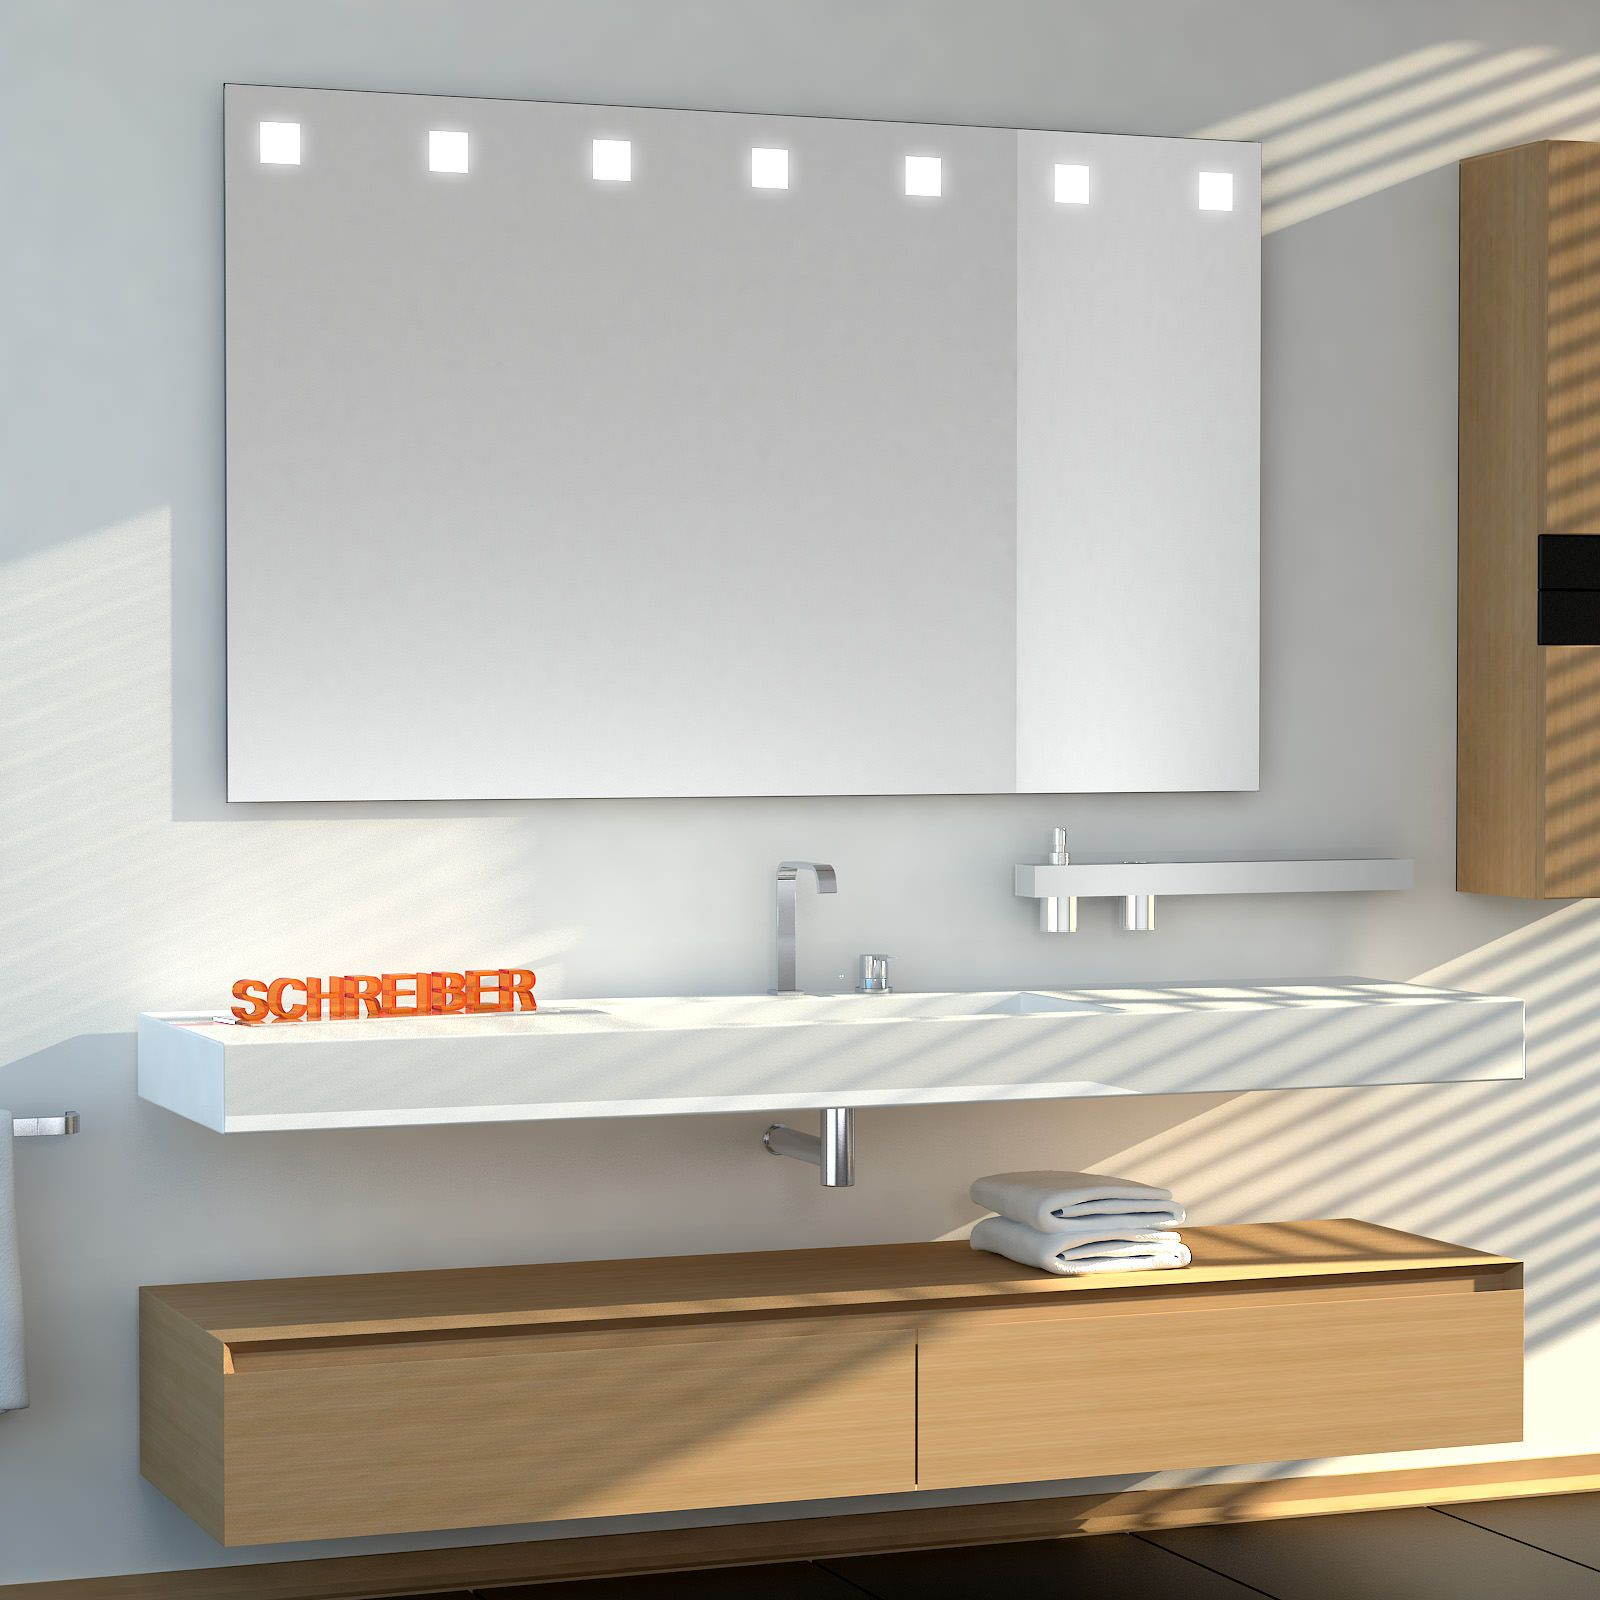 Badezimmerspiegel Carre Top Ledplus Badezimmerspiegel Lichtspiegel Badspiegel